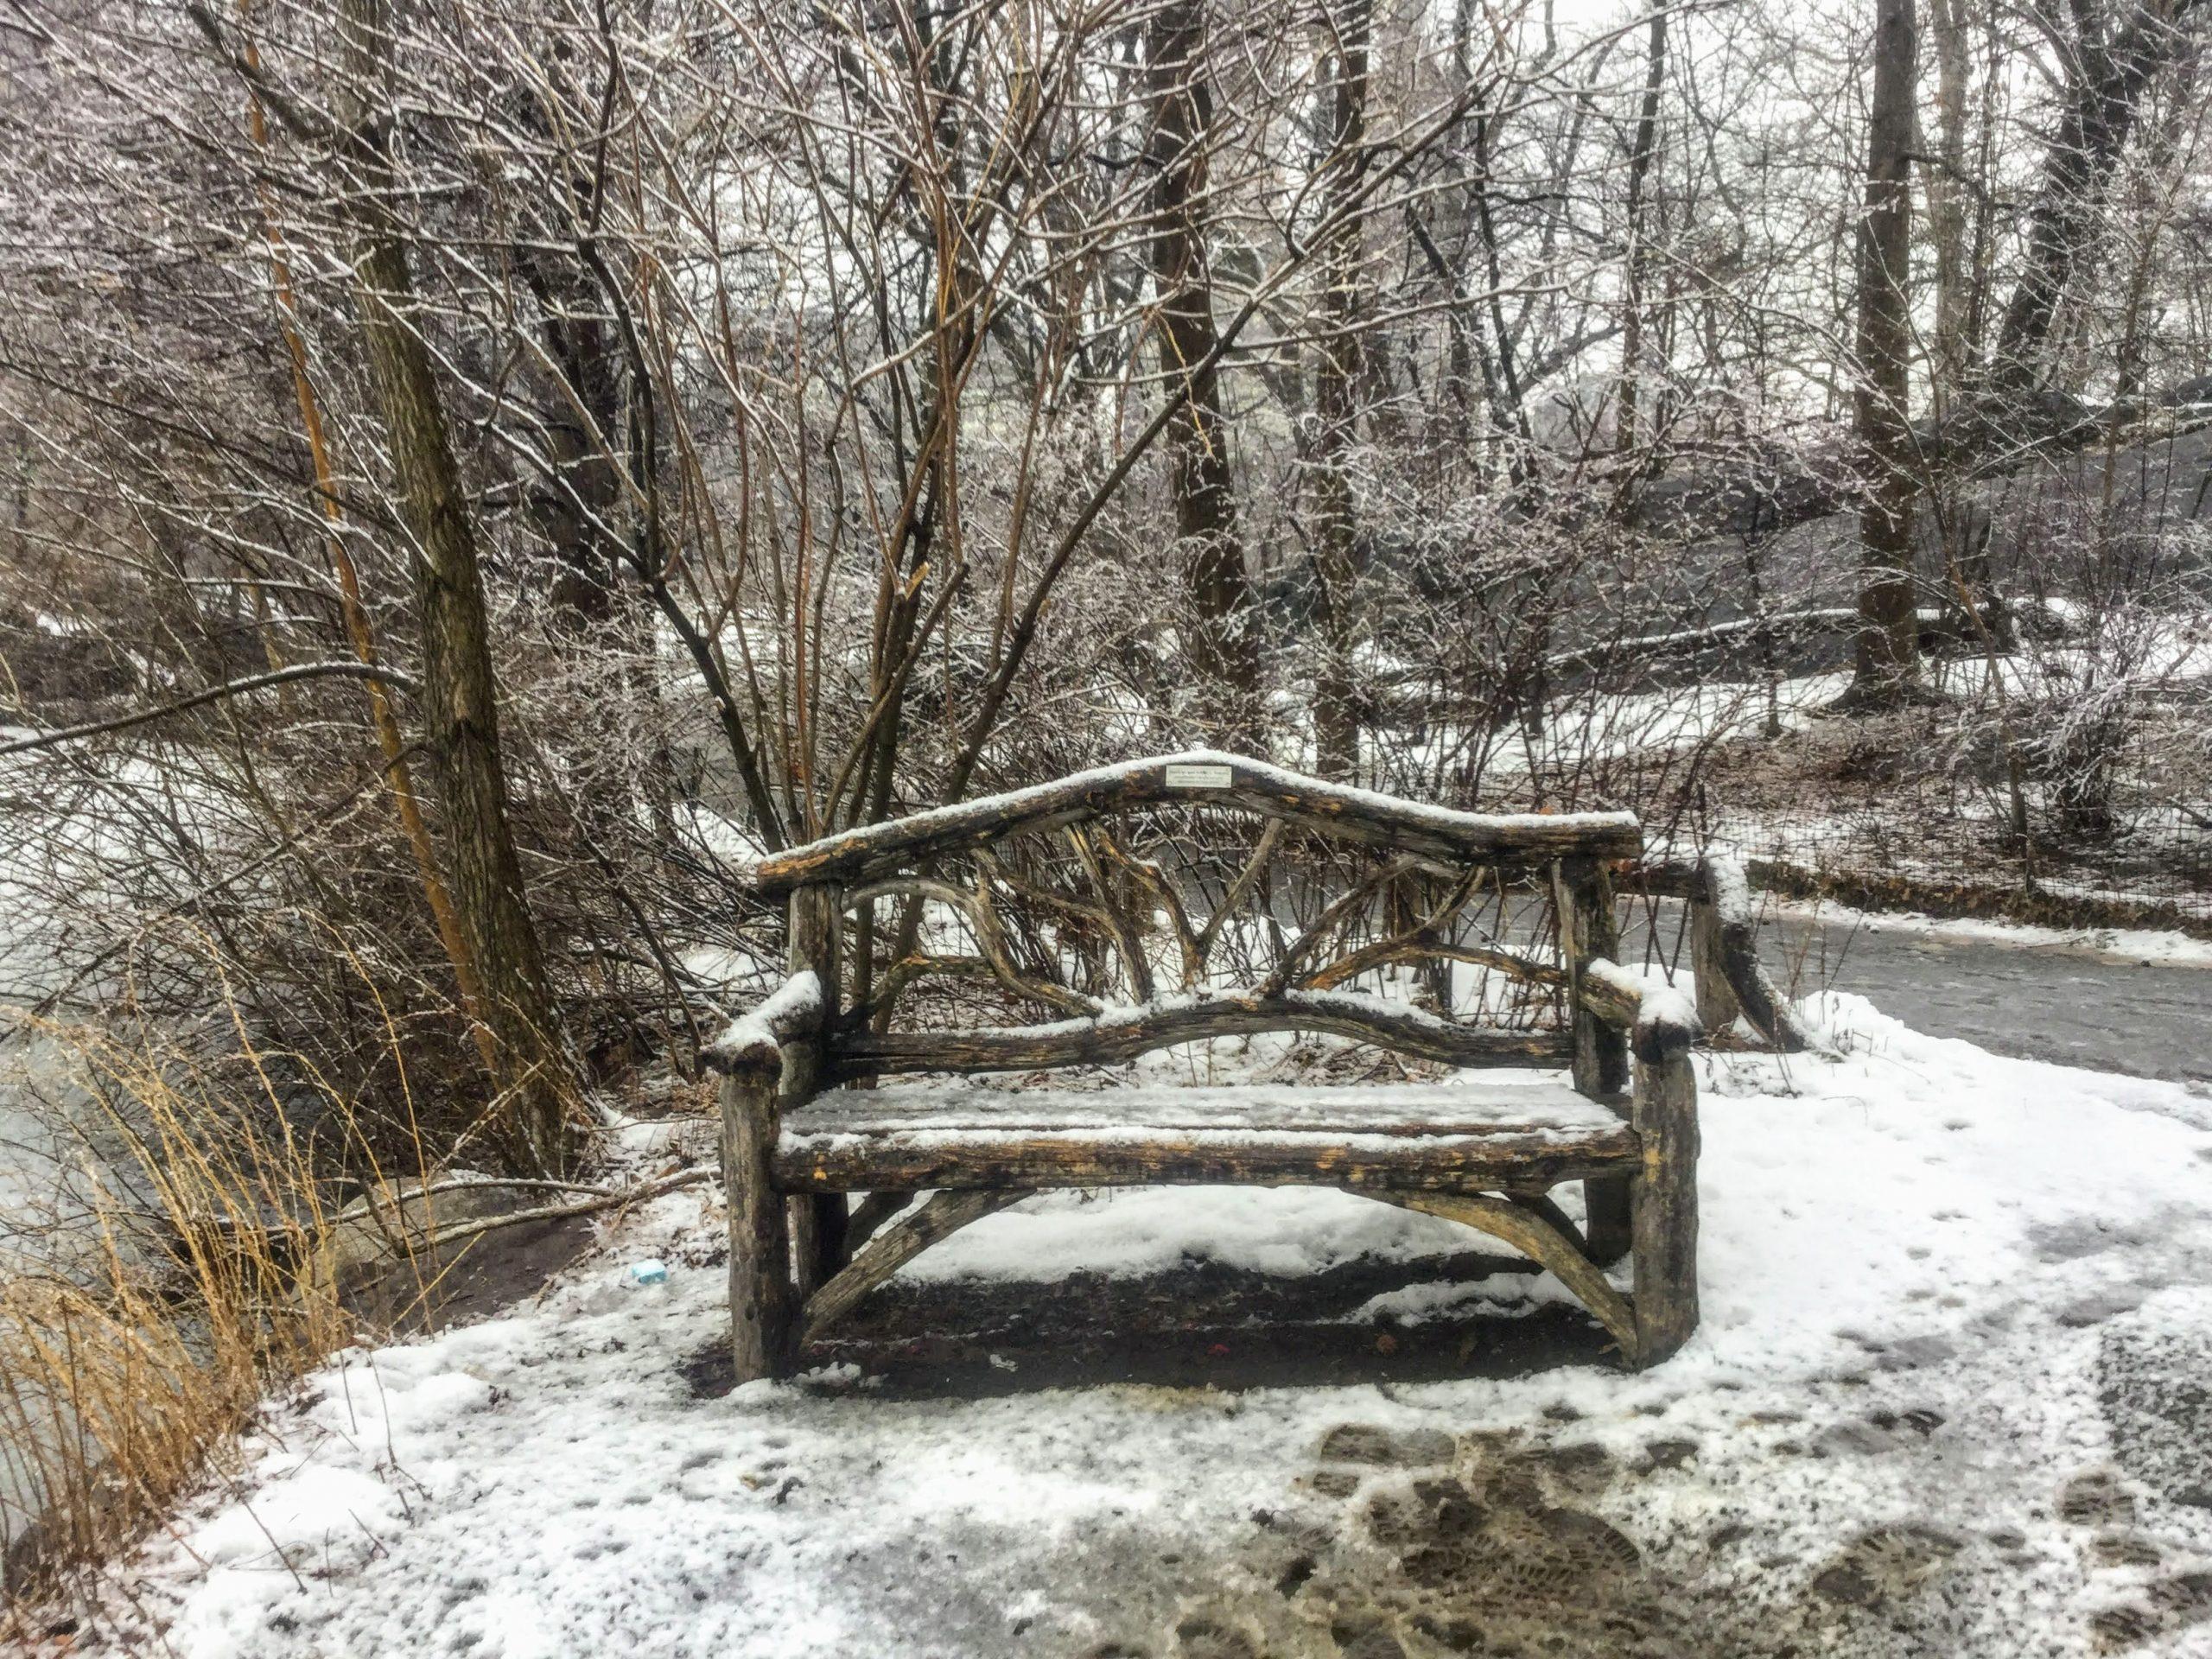 Central Park wooden park bench